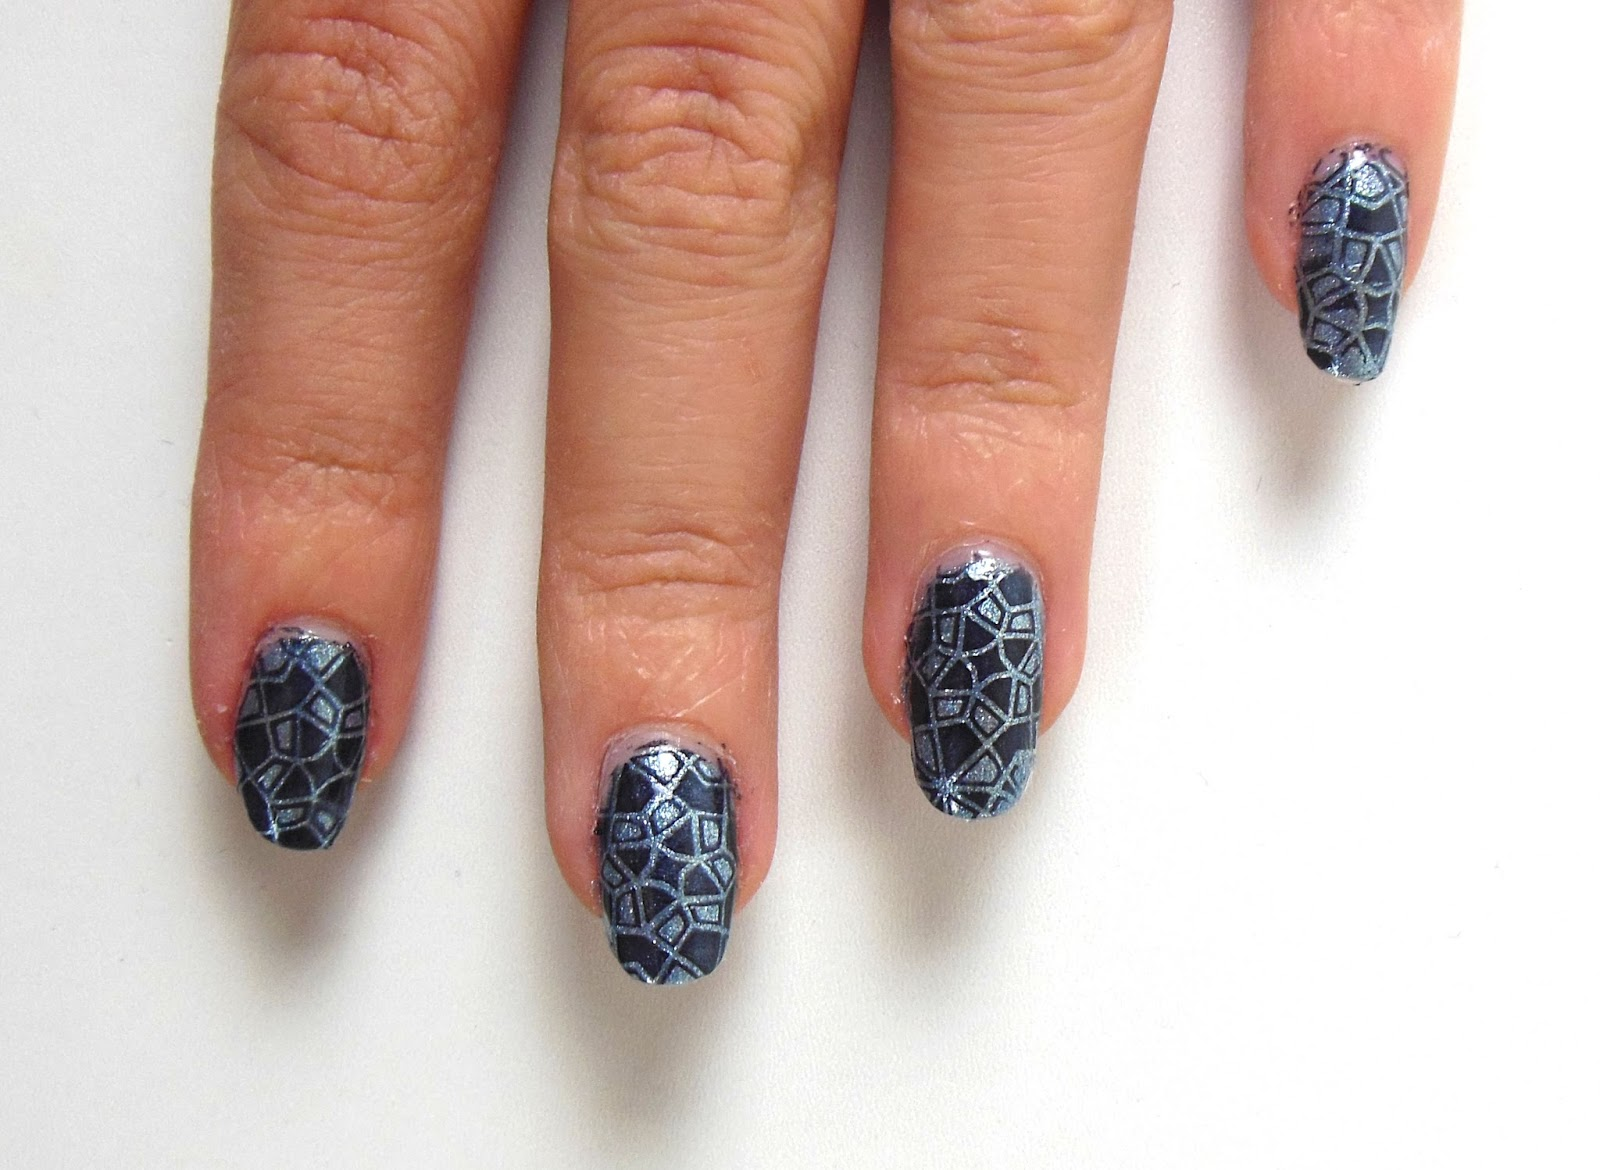 November 2015 - Nails All Over